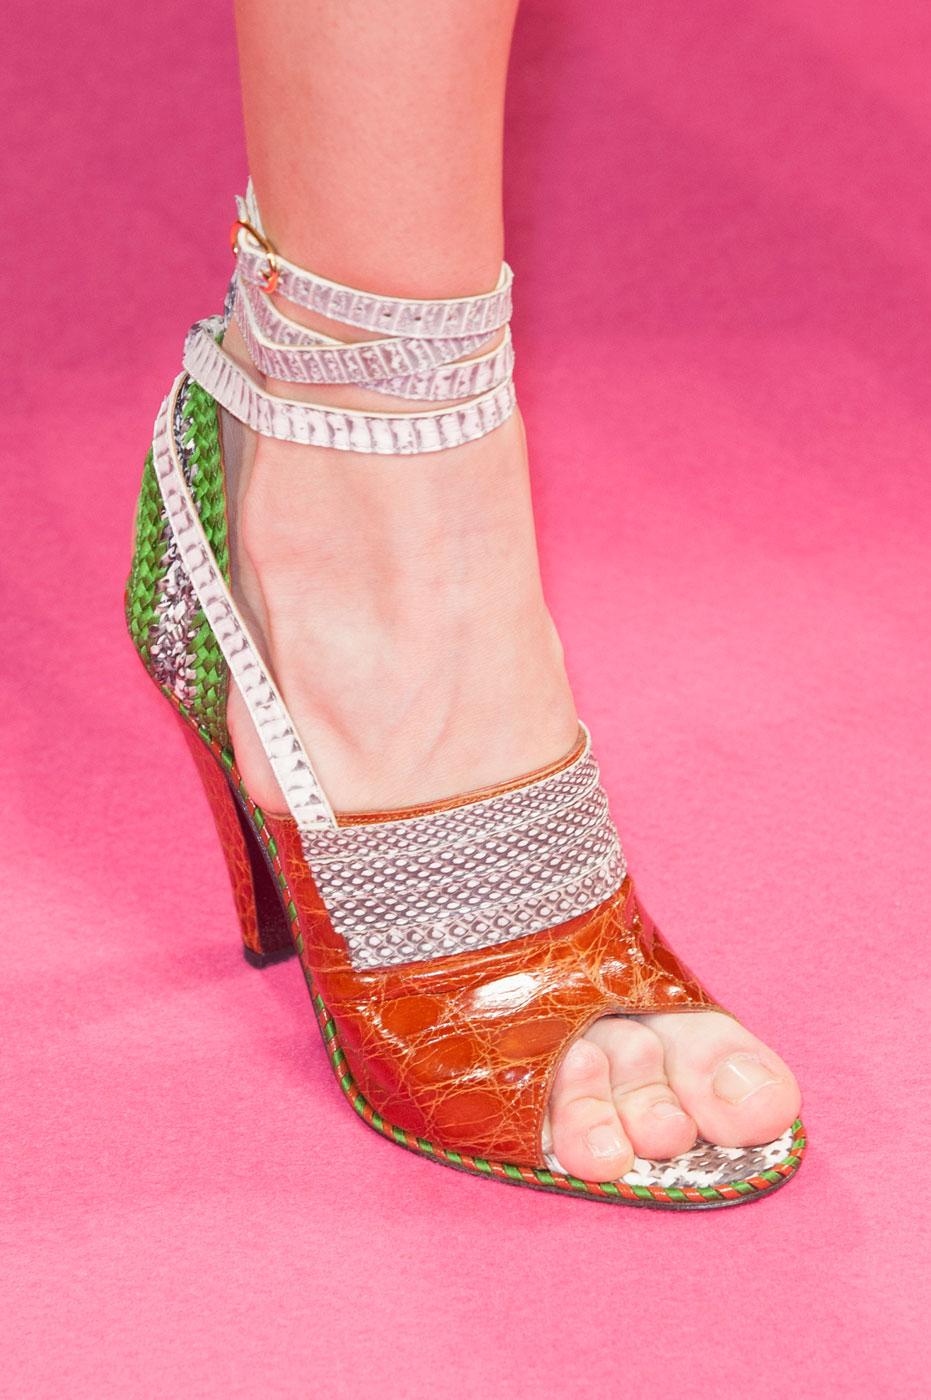 Schiaparelli-fashion-runway-show-close-ups-haute-couture-paris-spring-summer-2015-the-impression-15